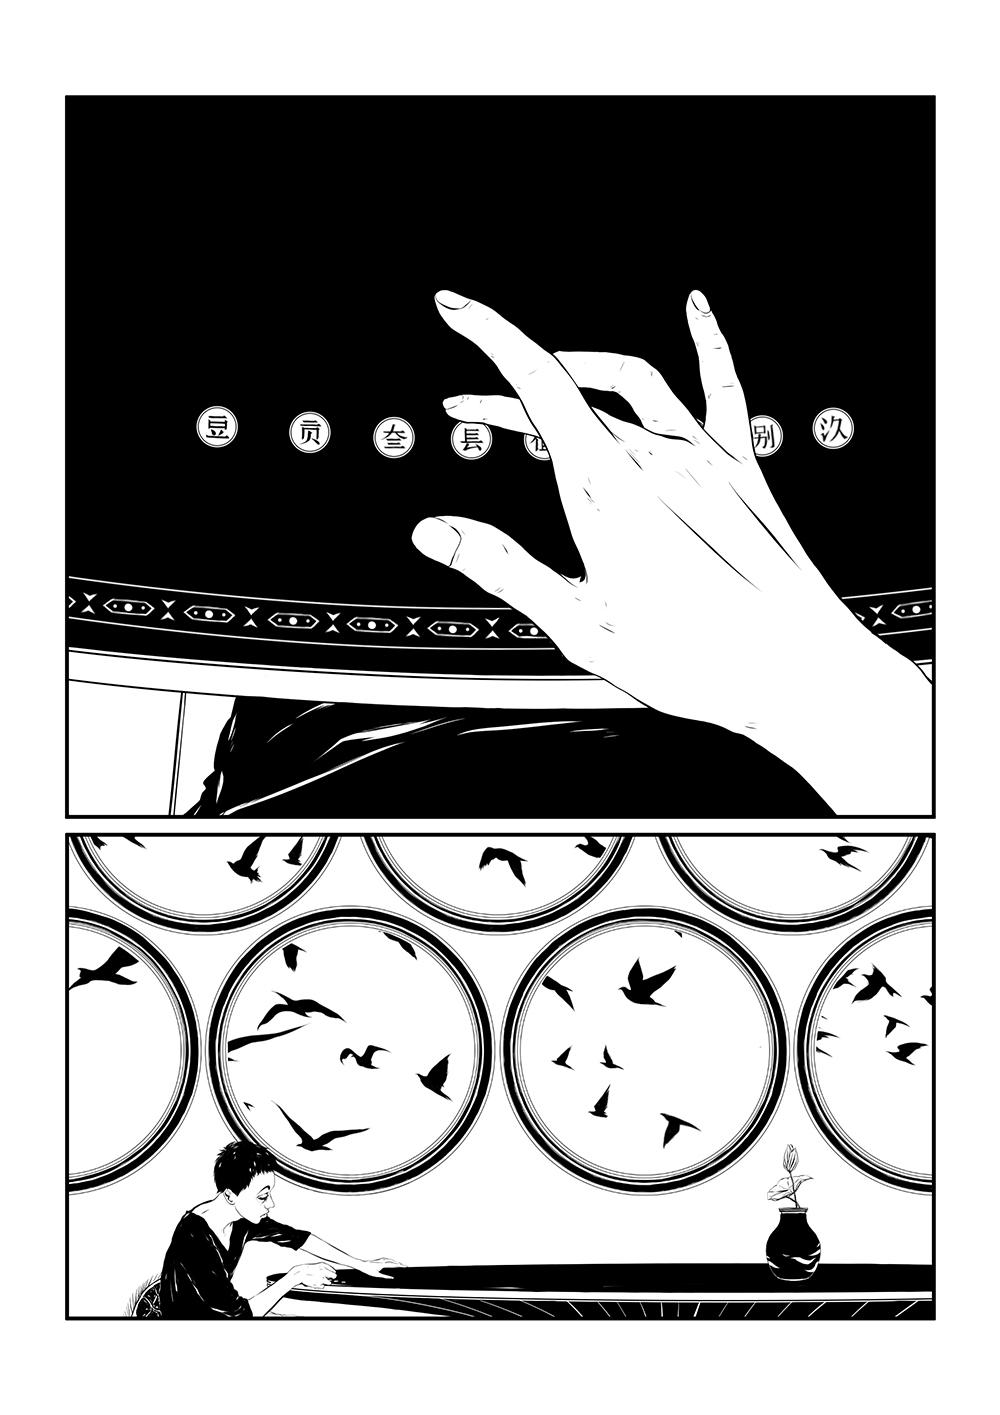 mojowang_illustration_betweenrivers_21_2.jpg